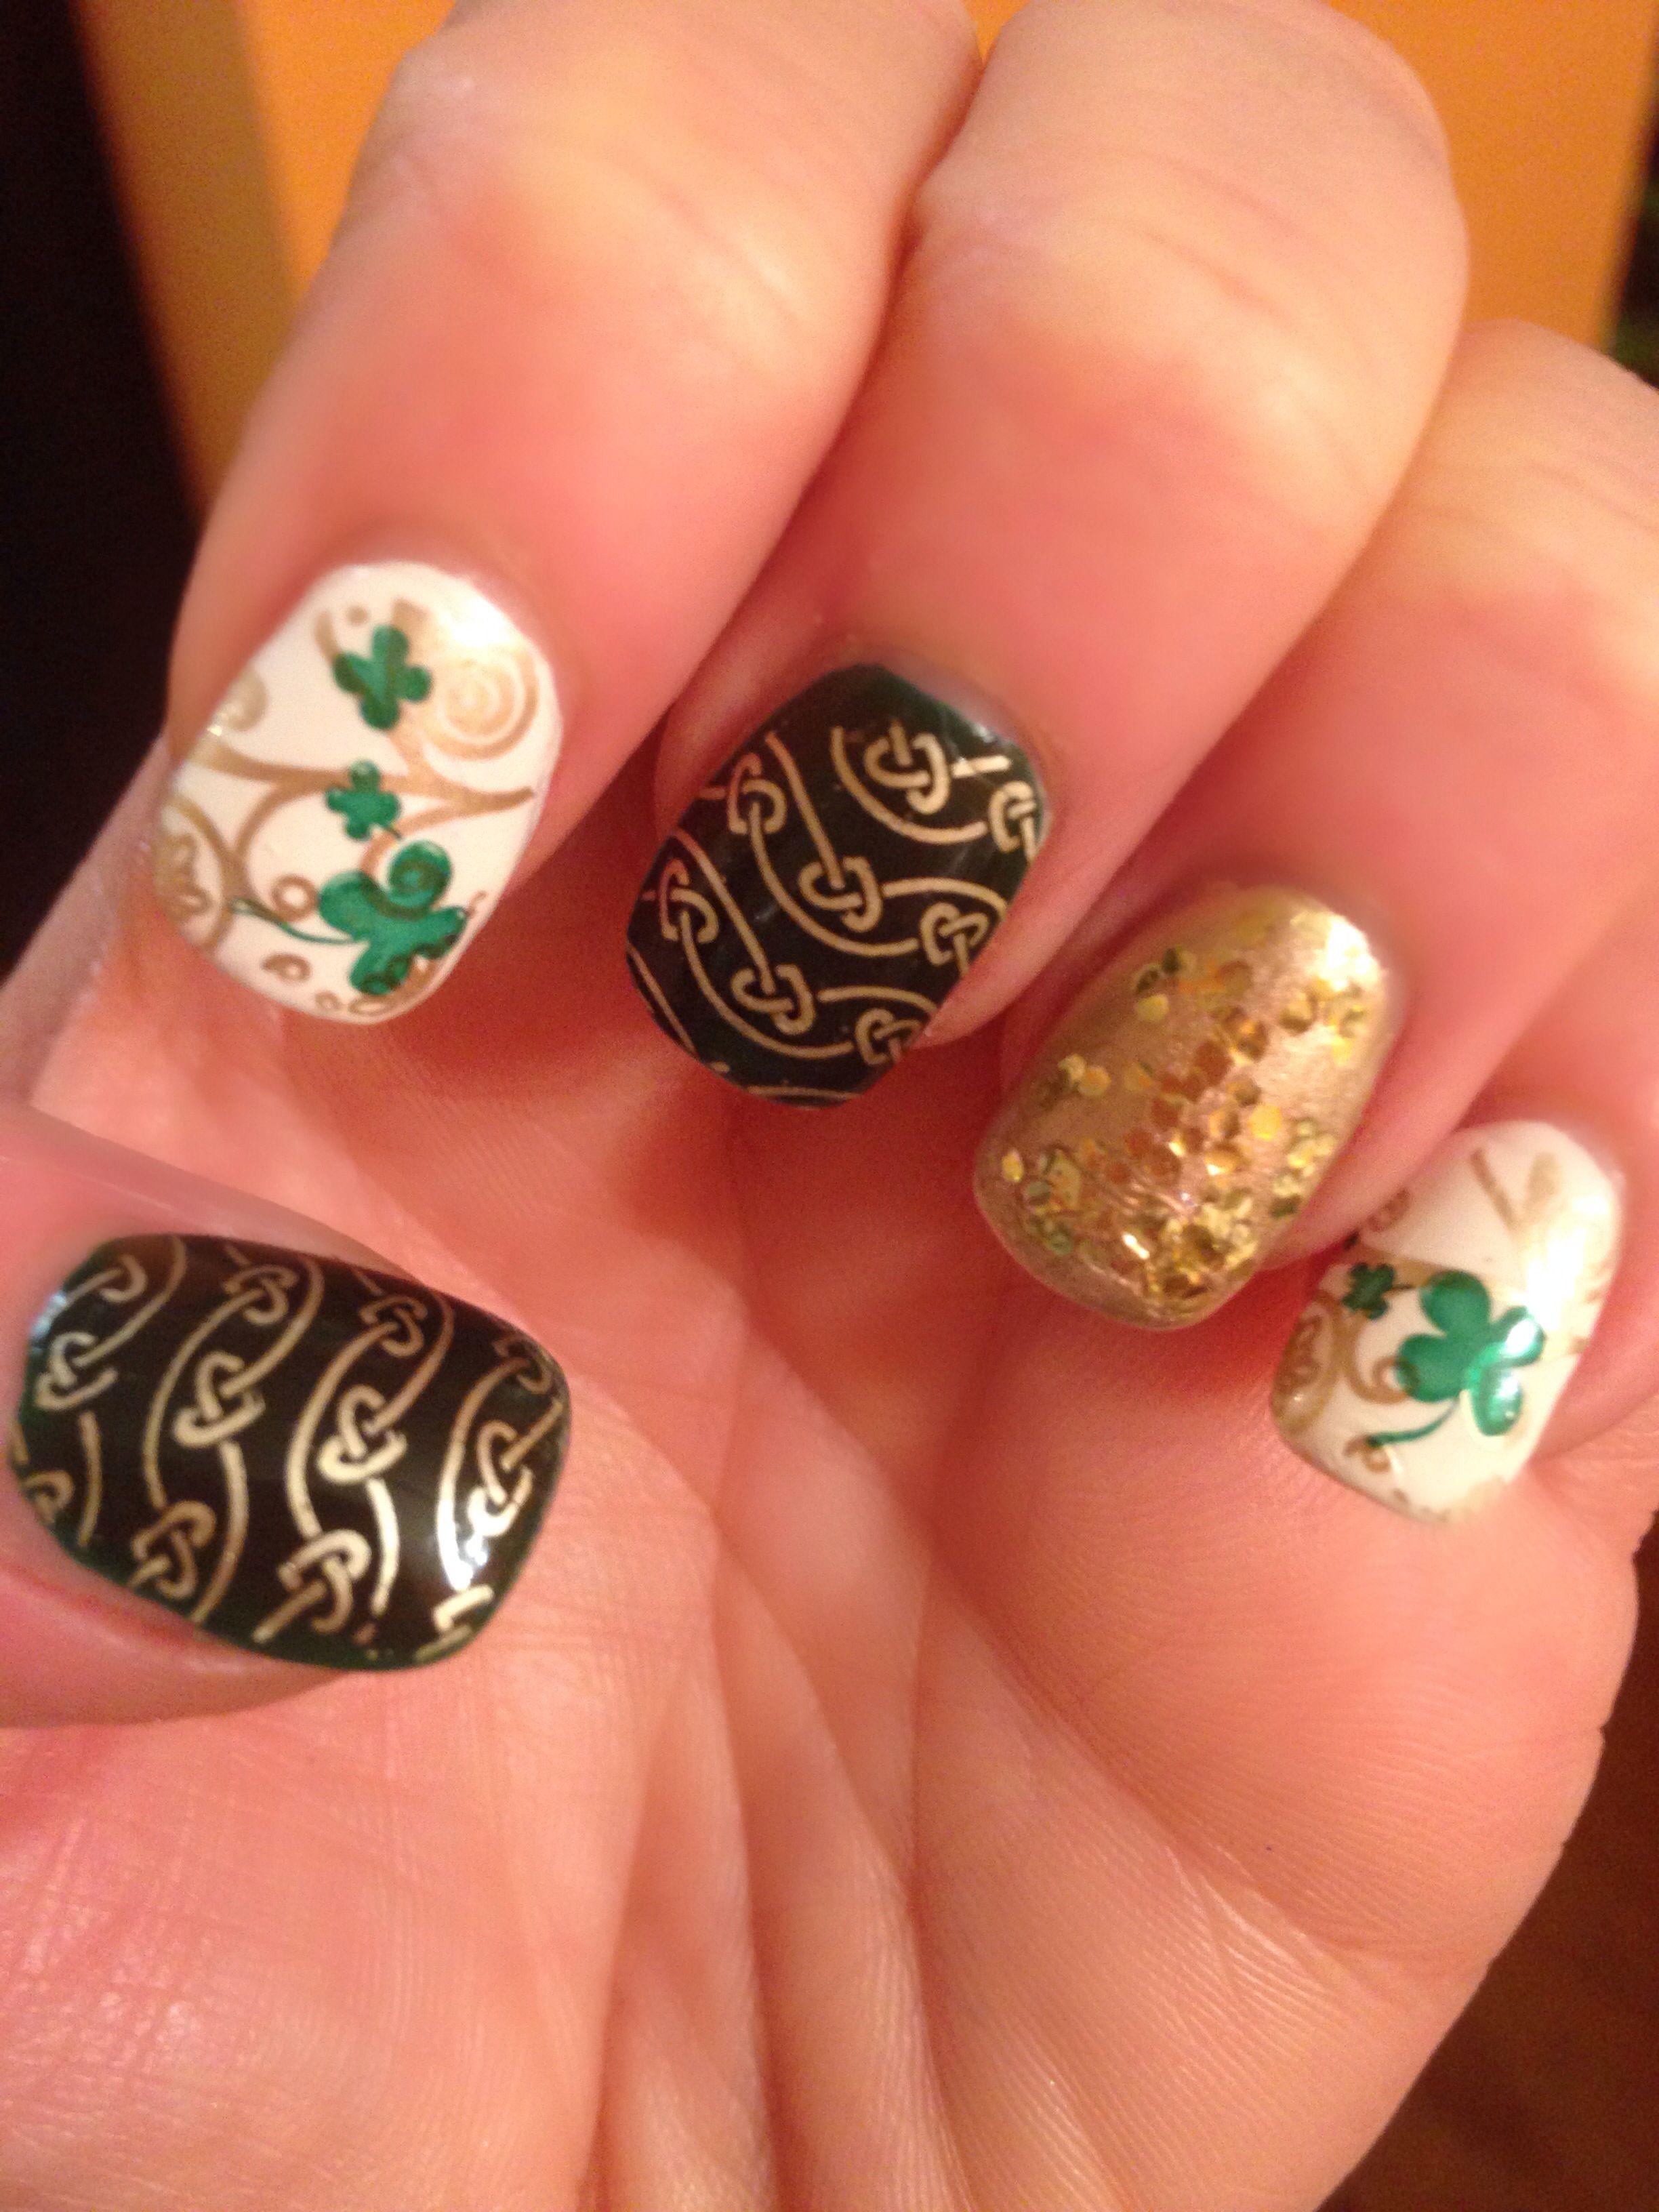 St patricks day nail art using bundle monster and mash plates ...